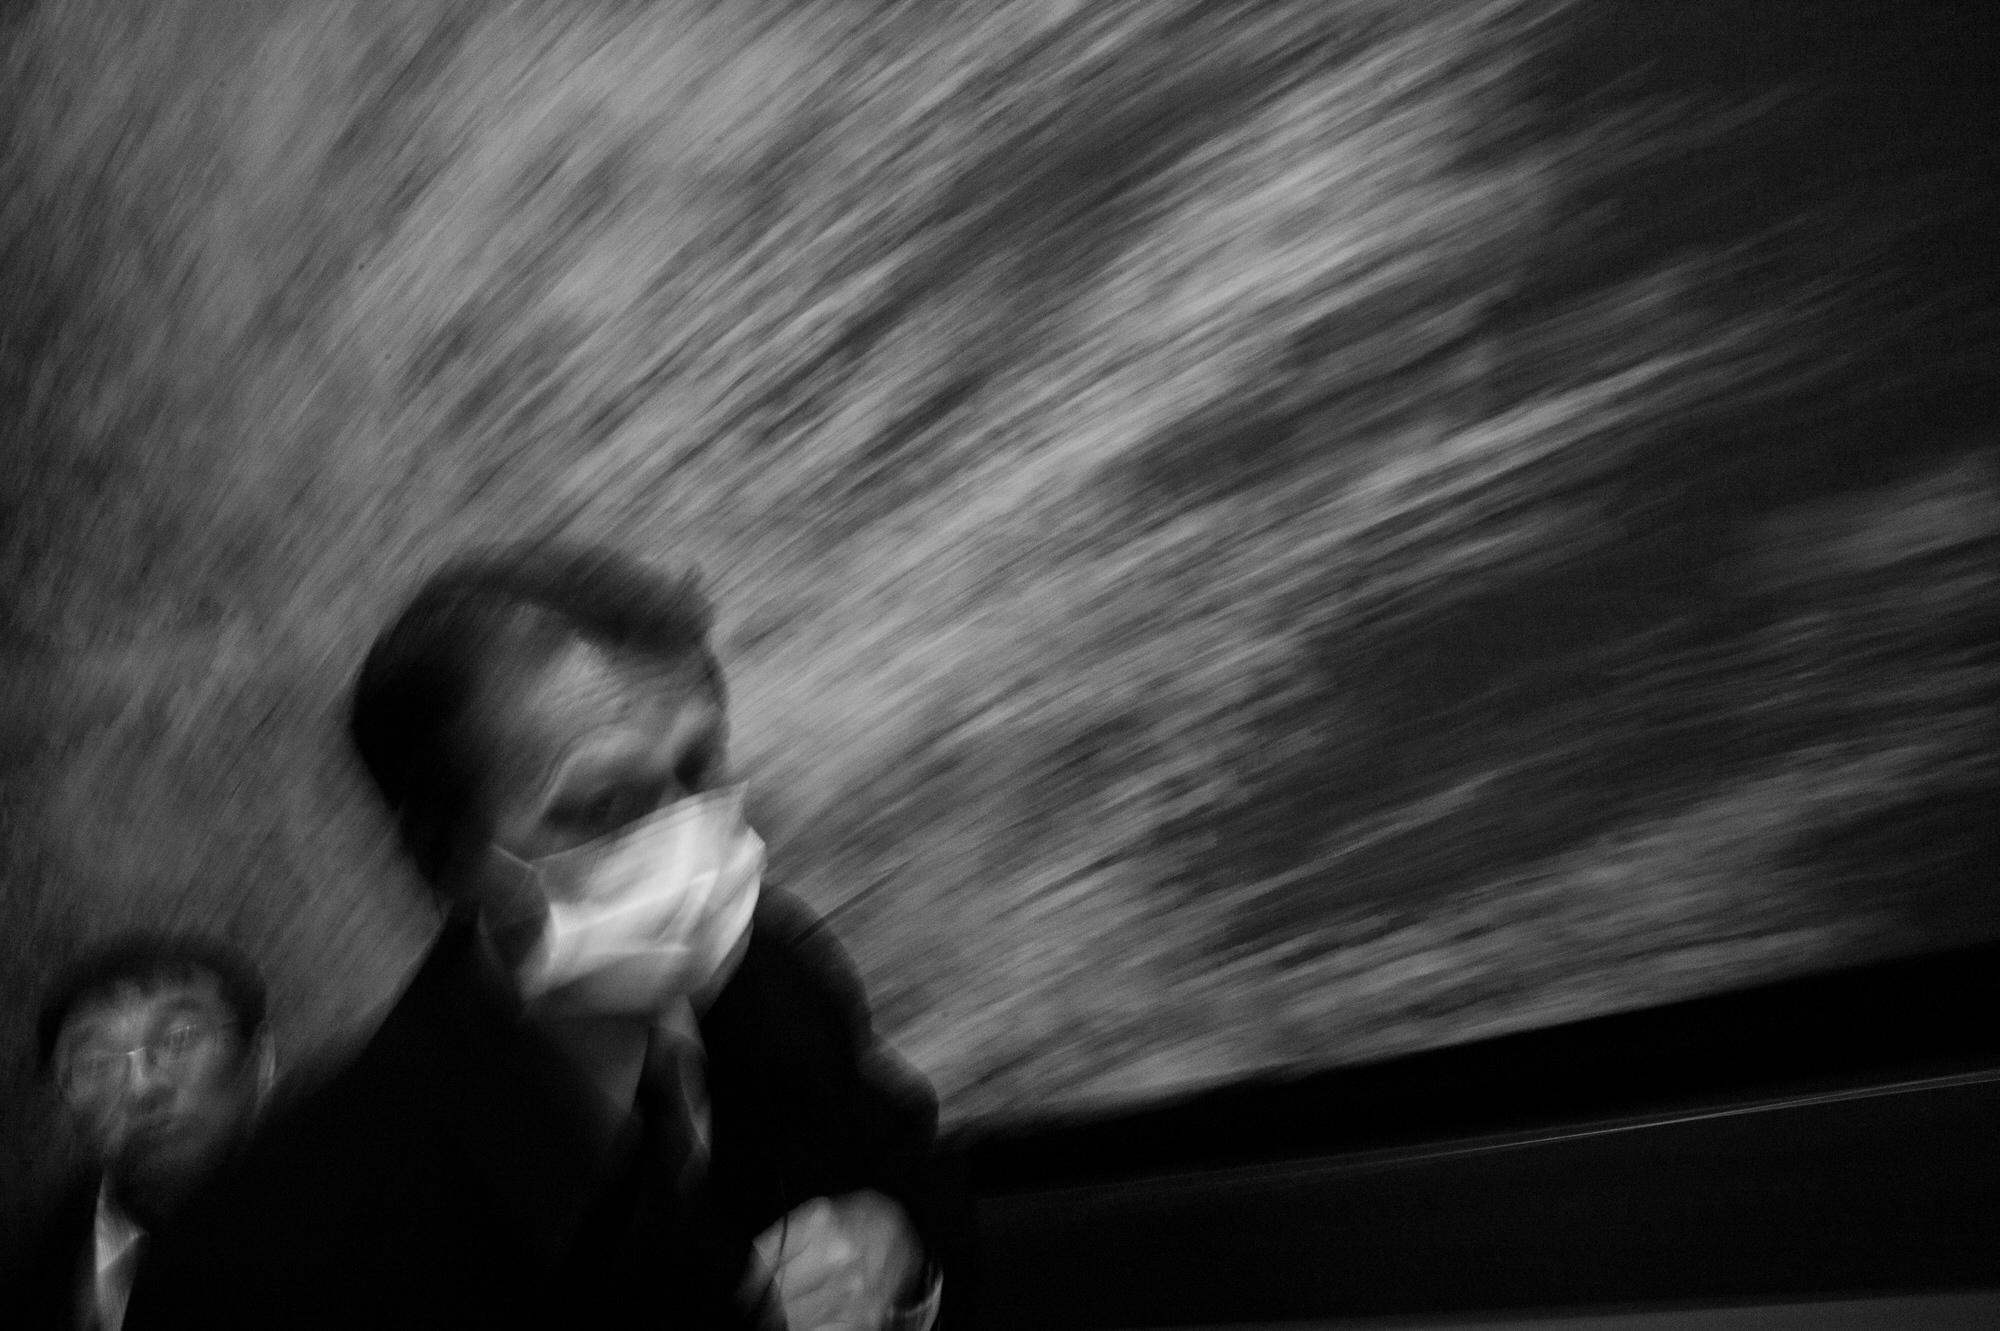 eric kim photography black and white - 6439268129_b6b79cb6e5_o